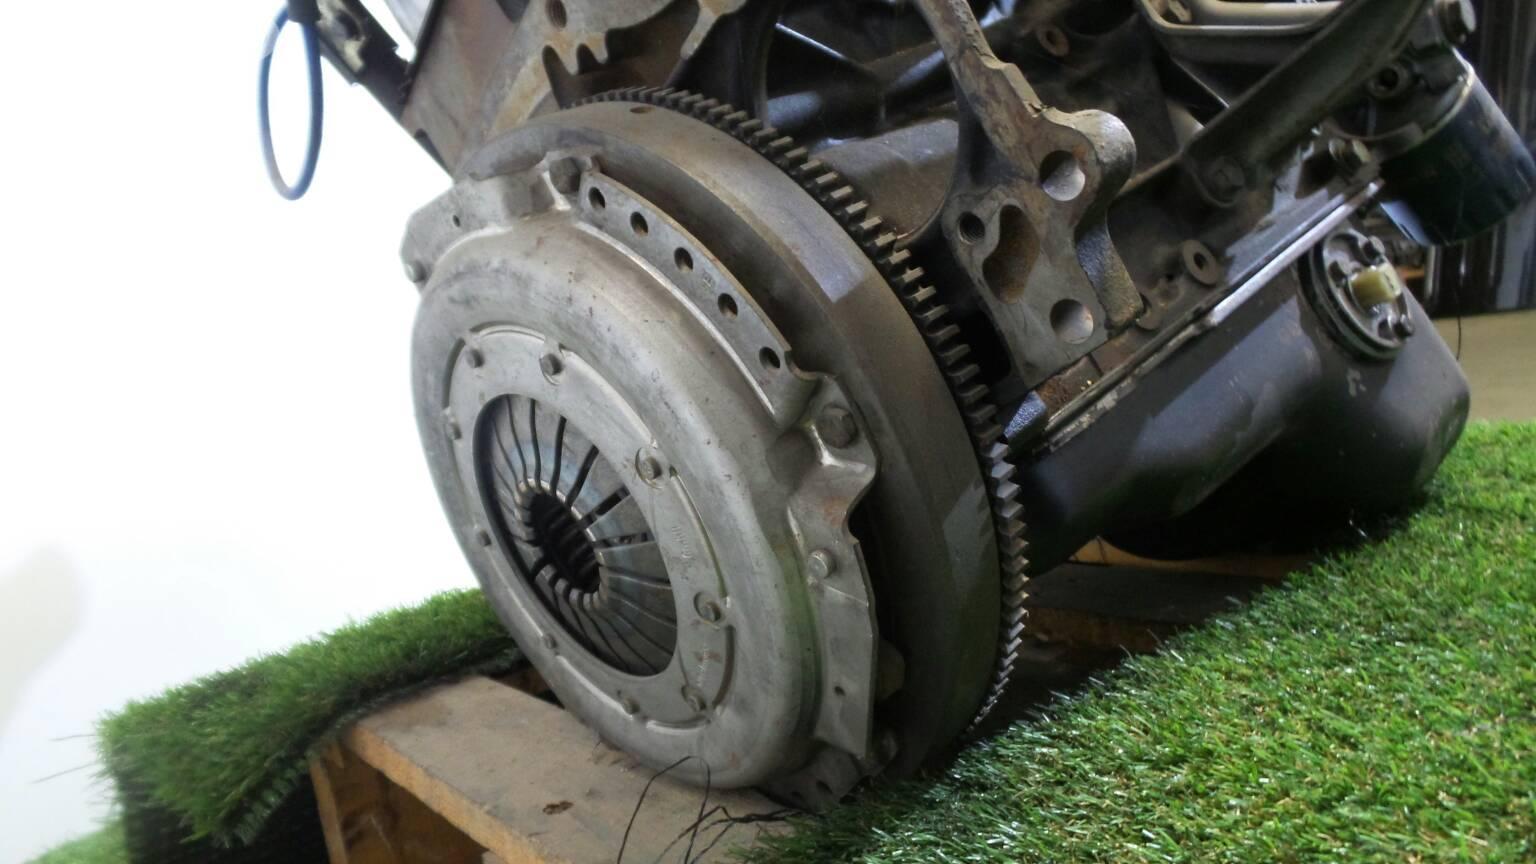 Engine Opel Omega A V87 20 F19 M19 N19 80696 Fuse Box Complete